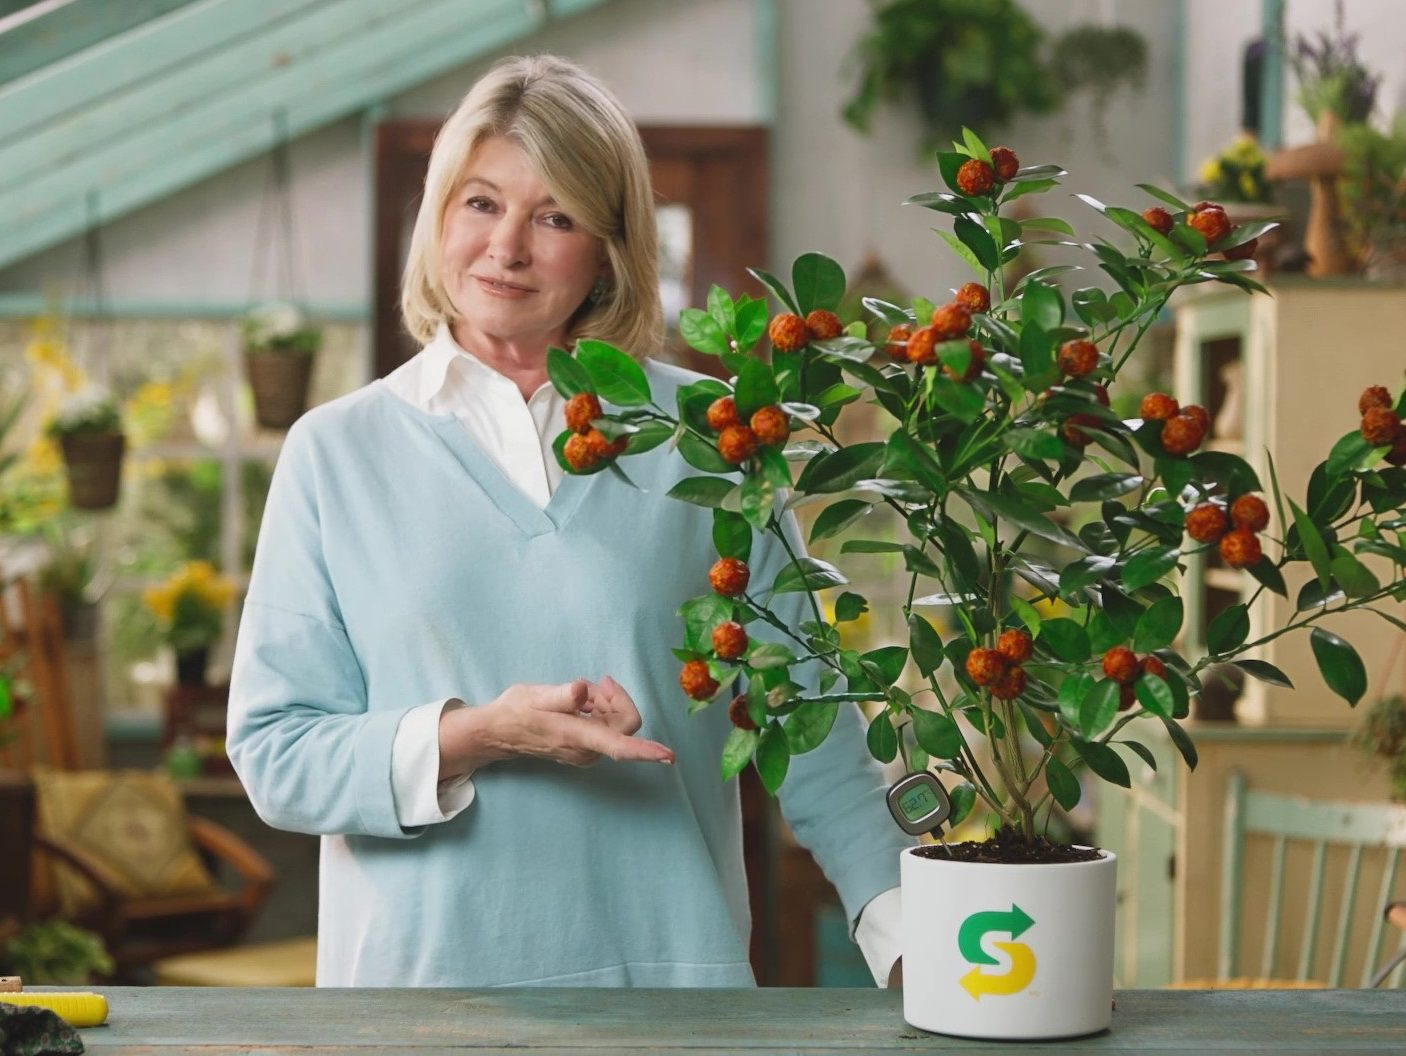 Martha Stewart promotes a plant-based sub for Subway